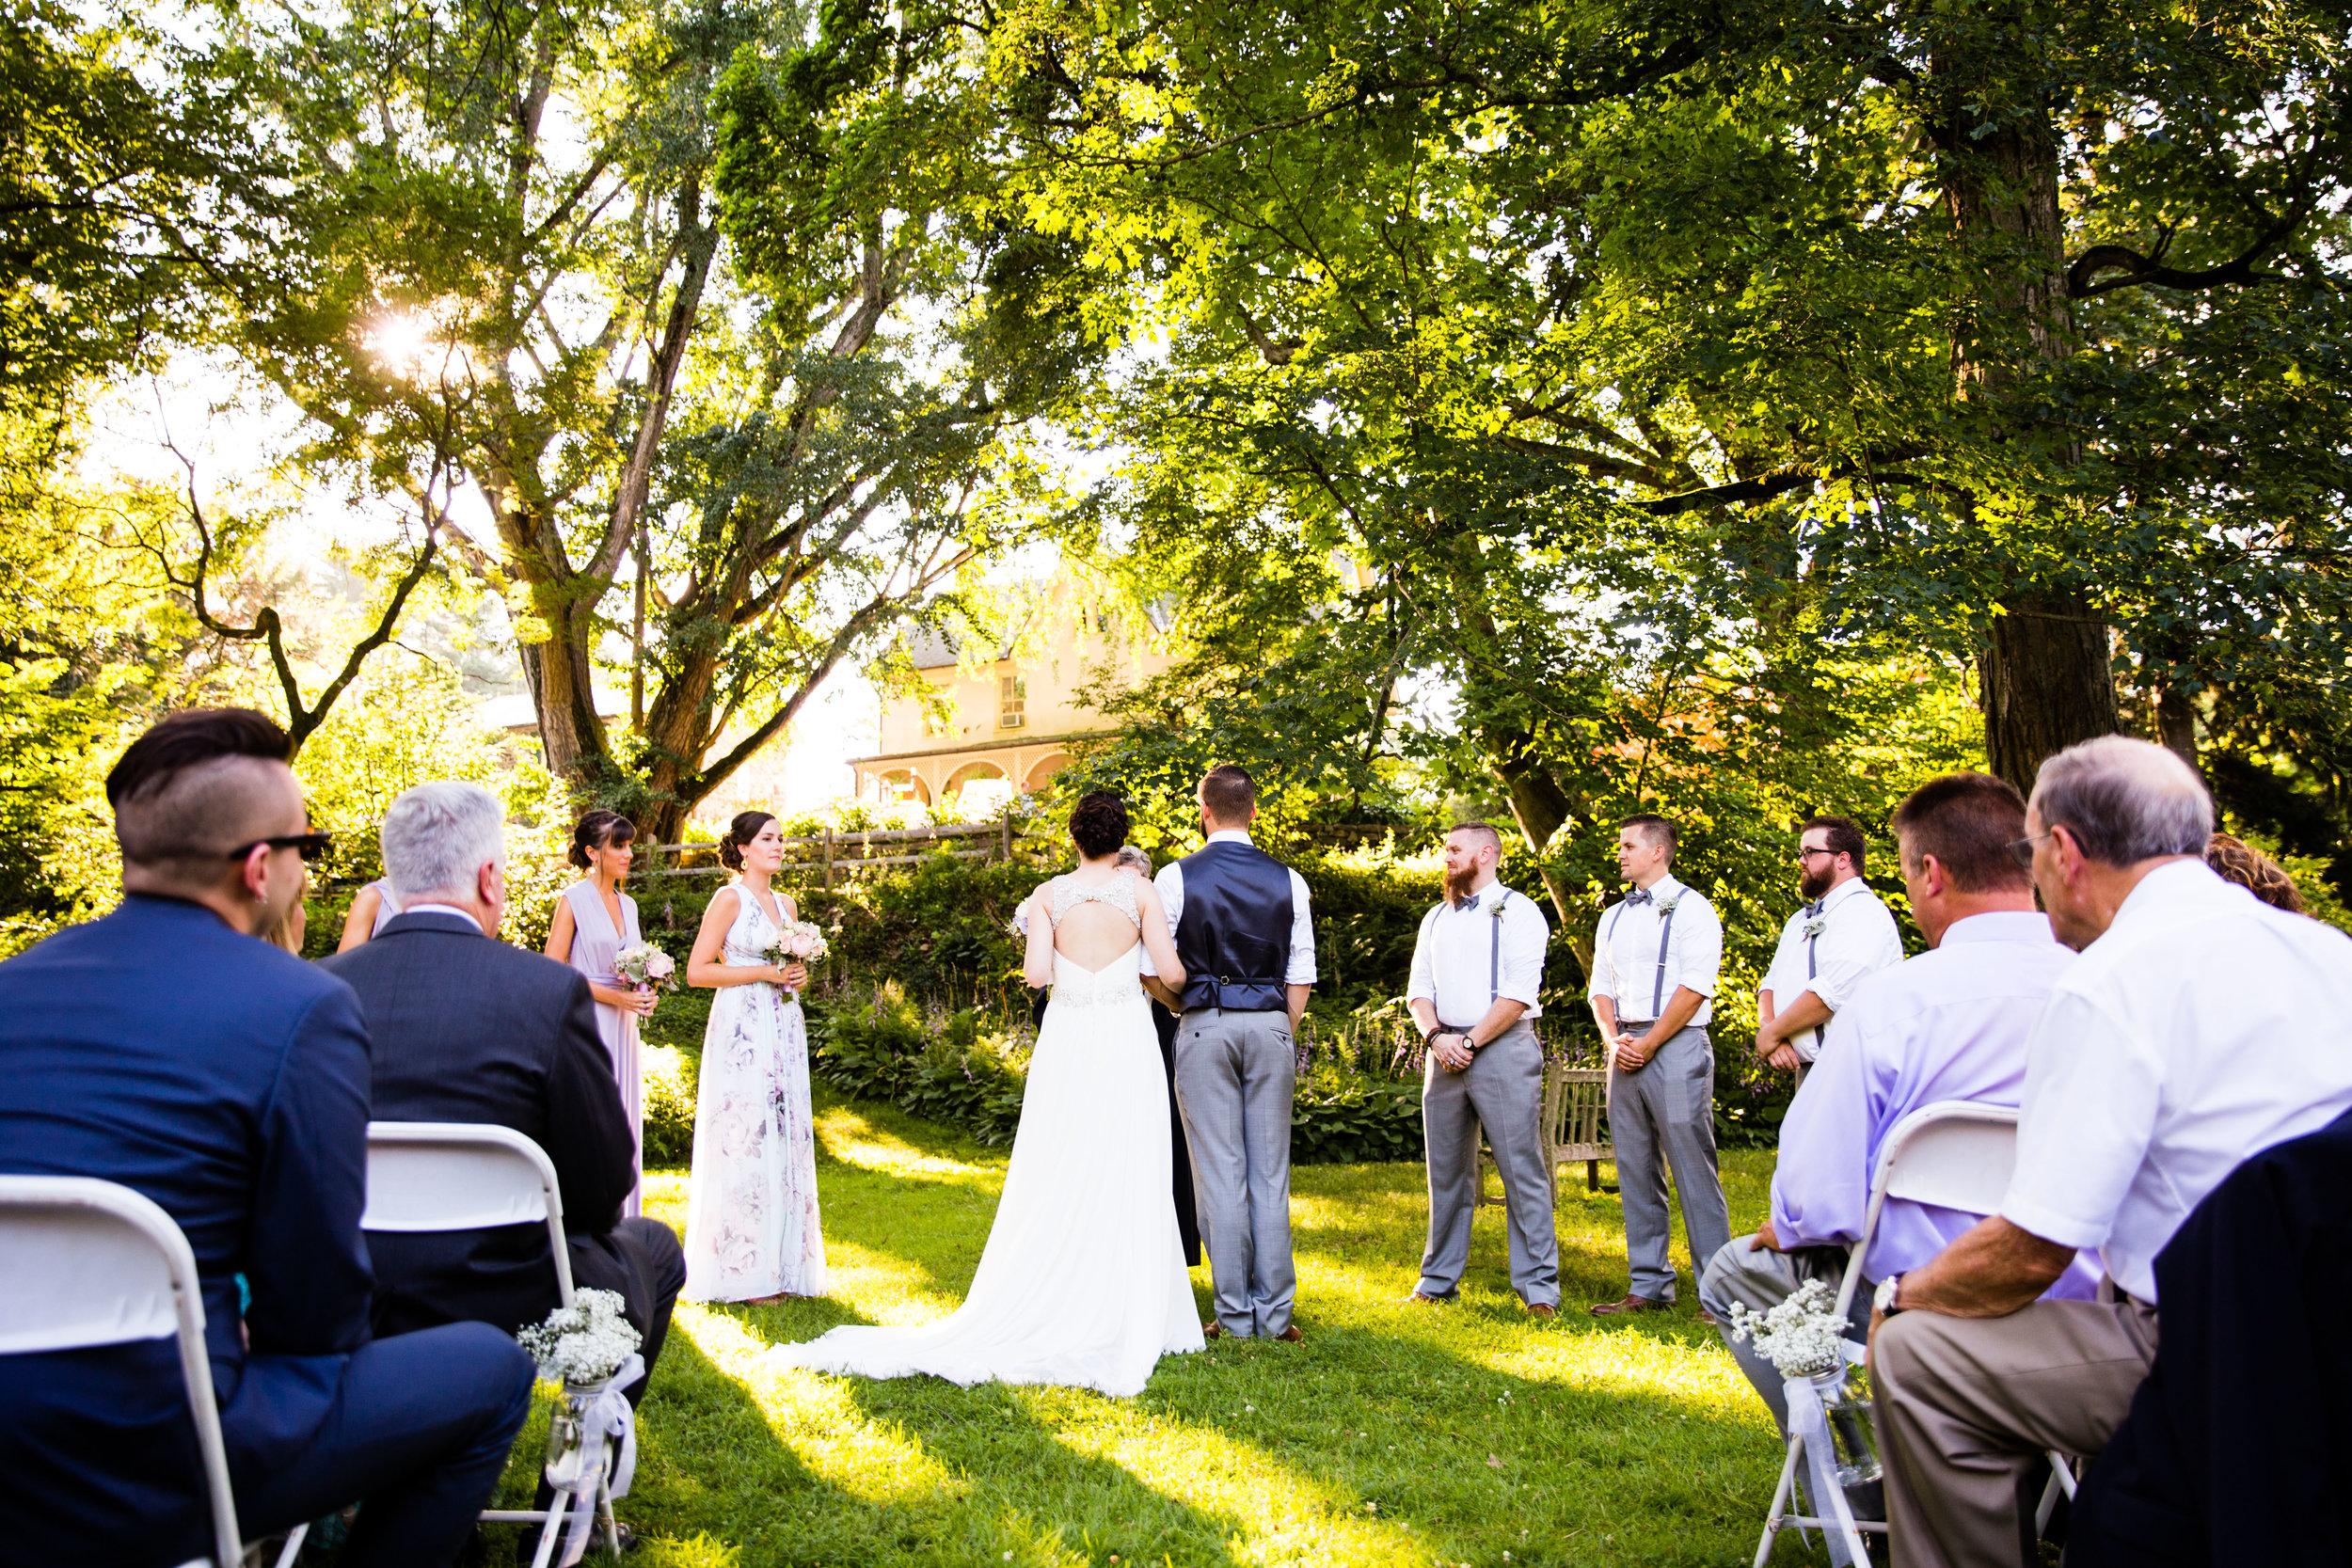 TYLER ARBORETUM WEDDING PHOTOGRAPHY LOVESTRUCK PICTURES-051.jpg